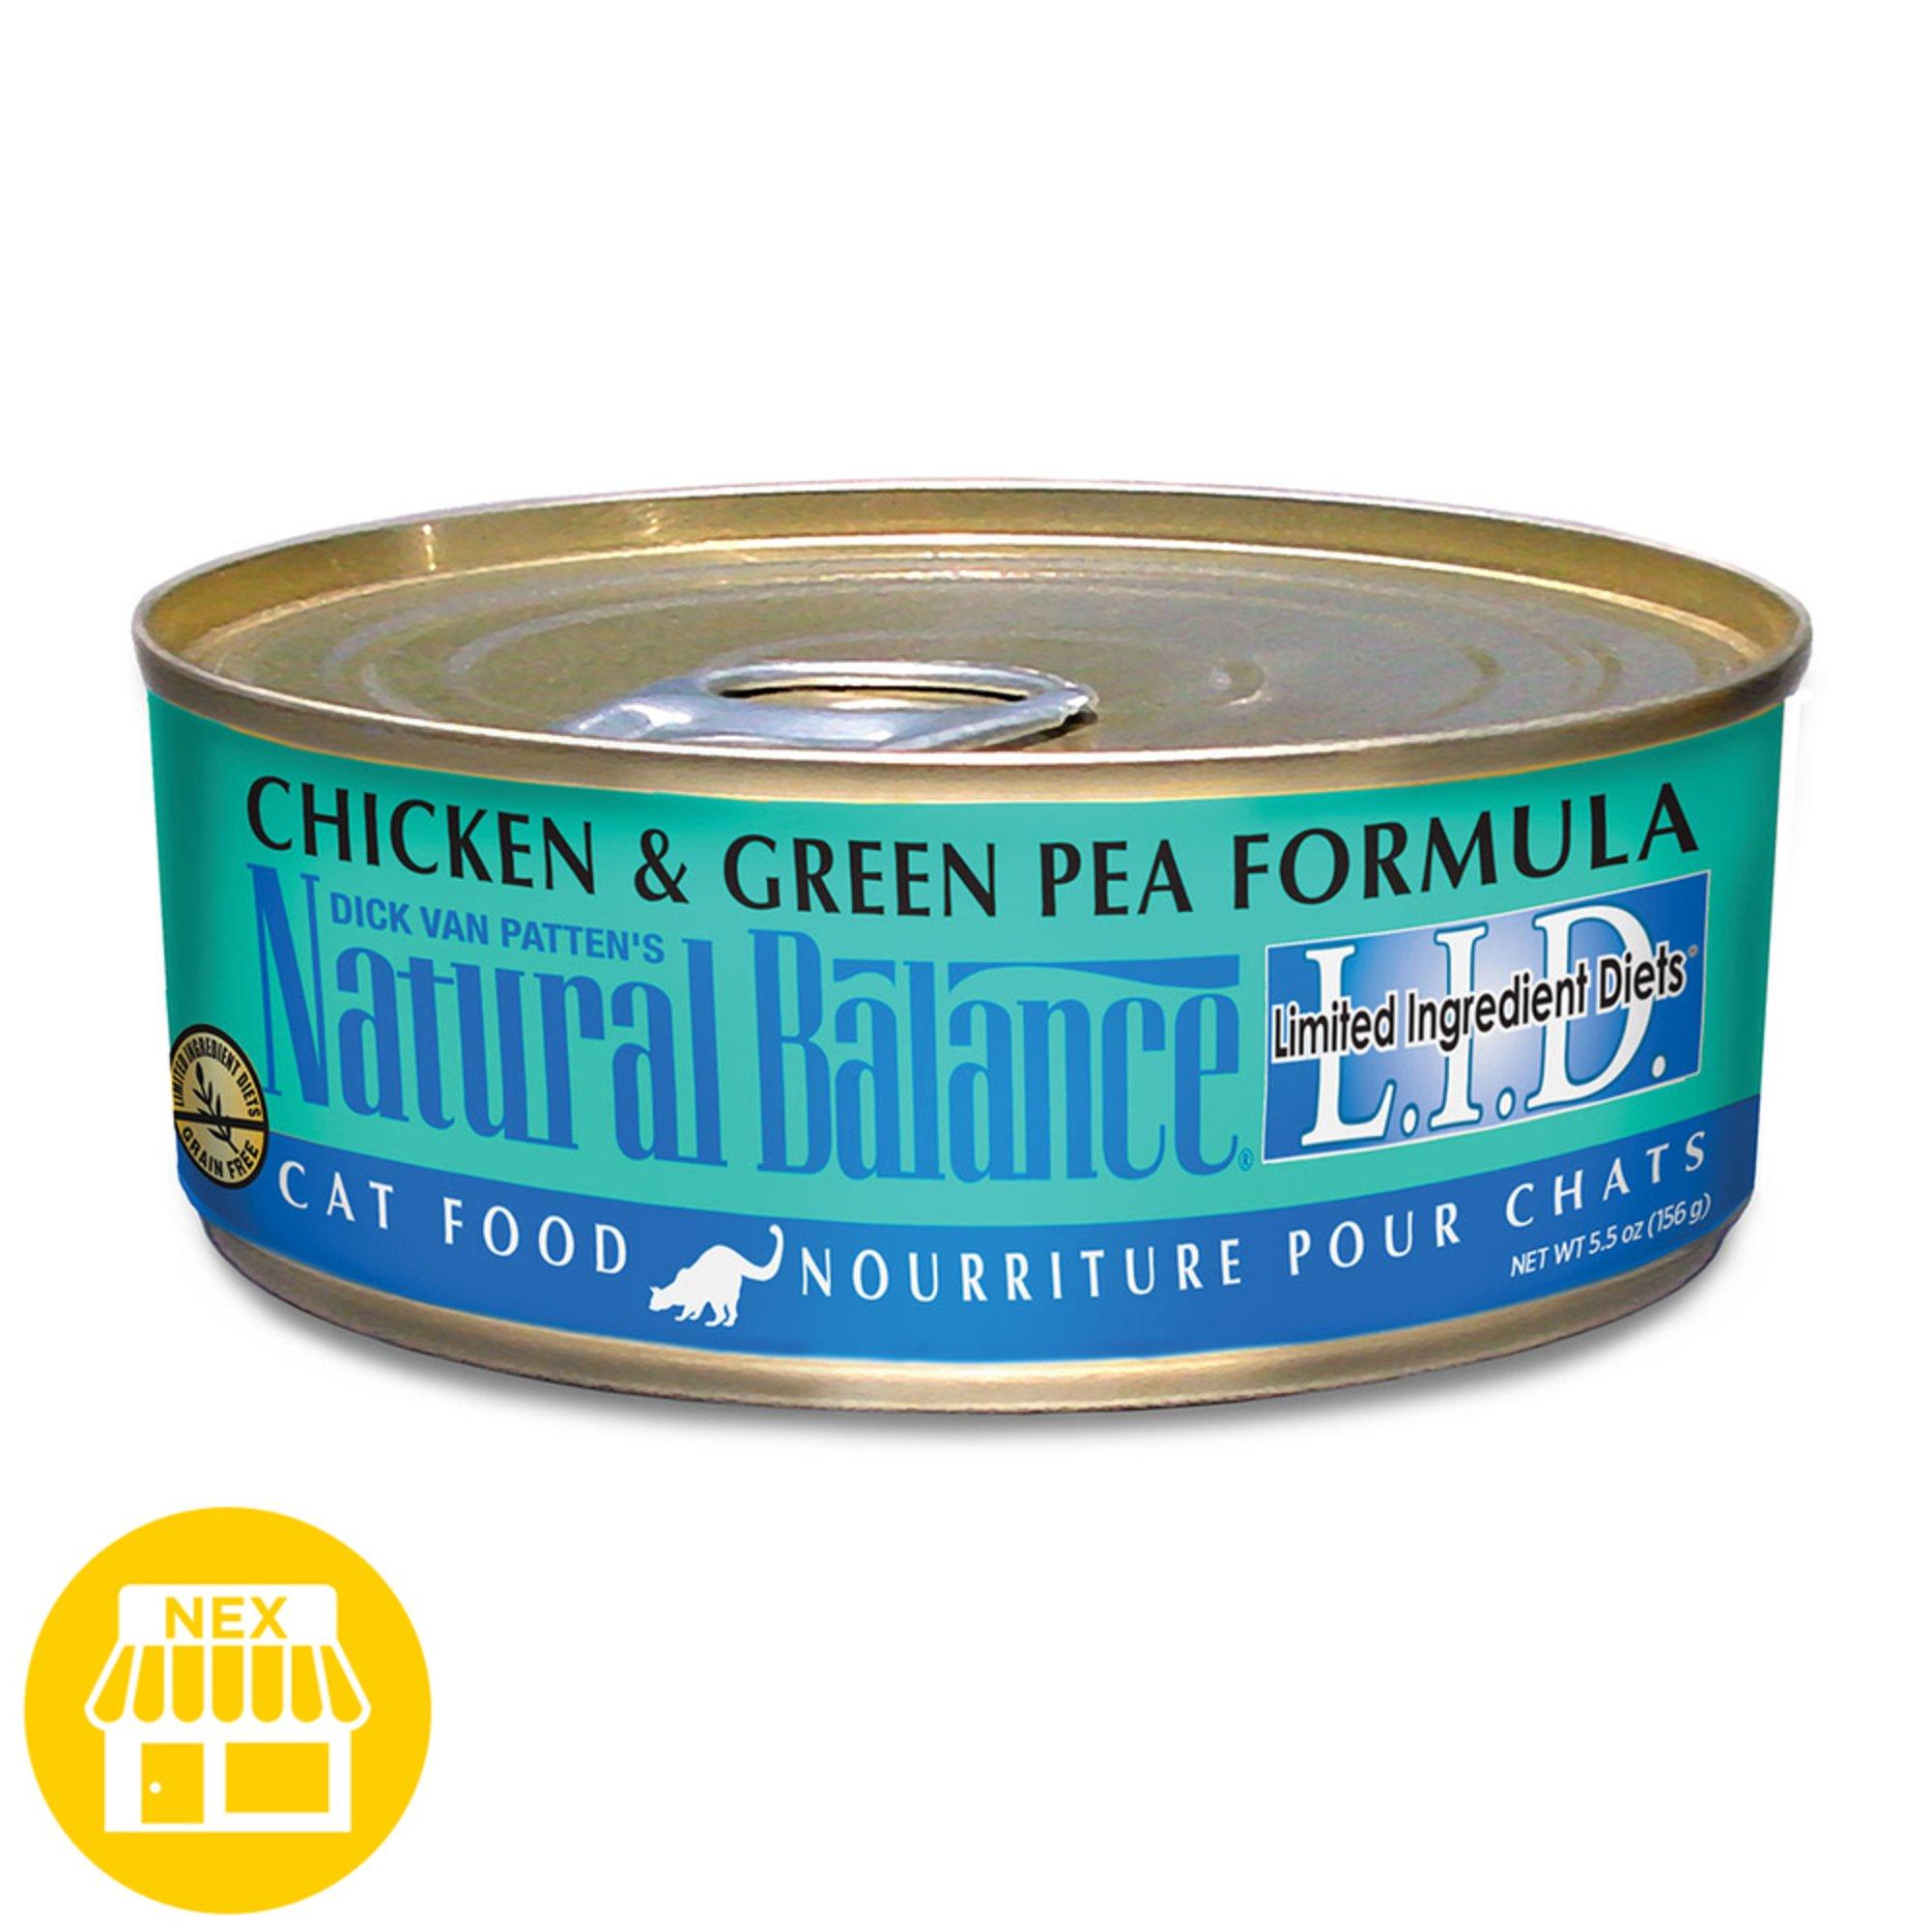 Natural Balance Grain Free Cat Food Reviews